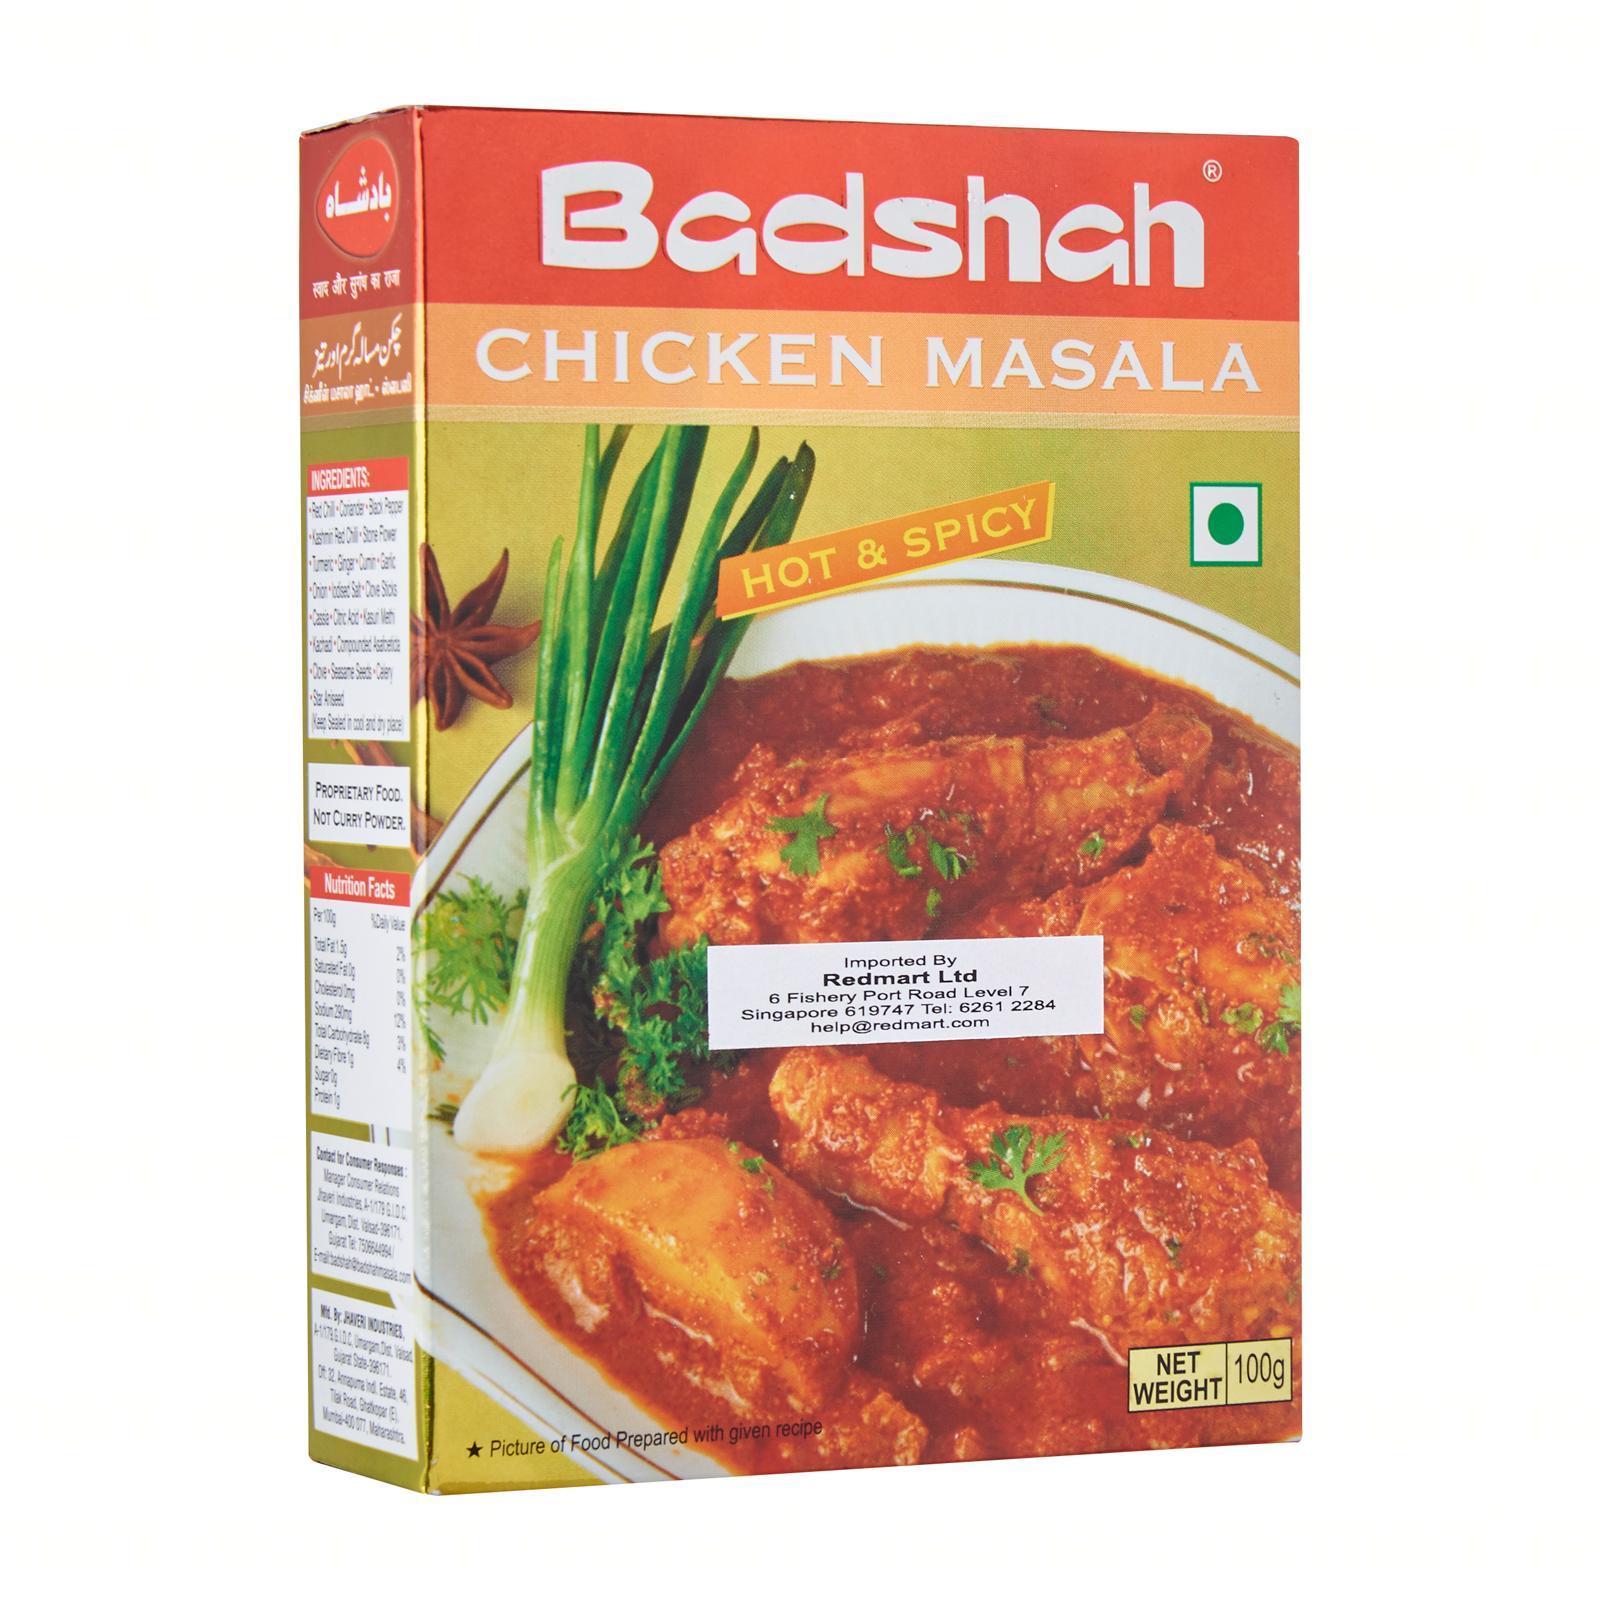 Badshah Hot And Spicy Chicken Masala